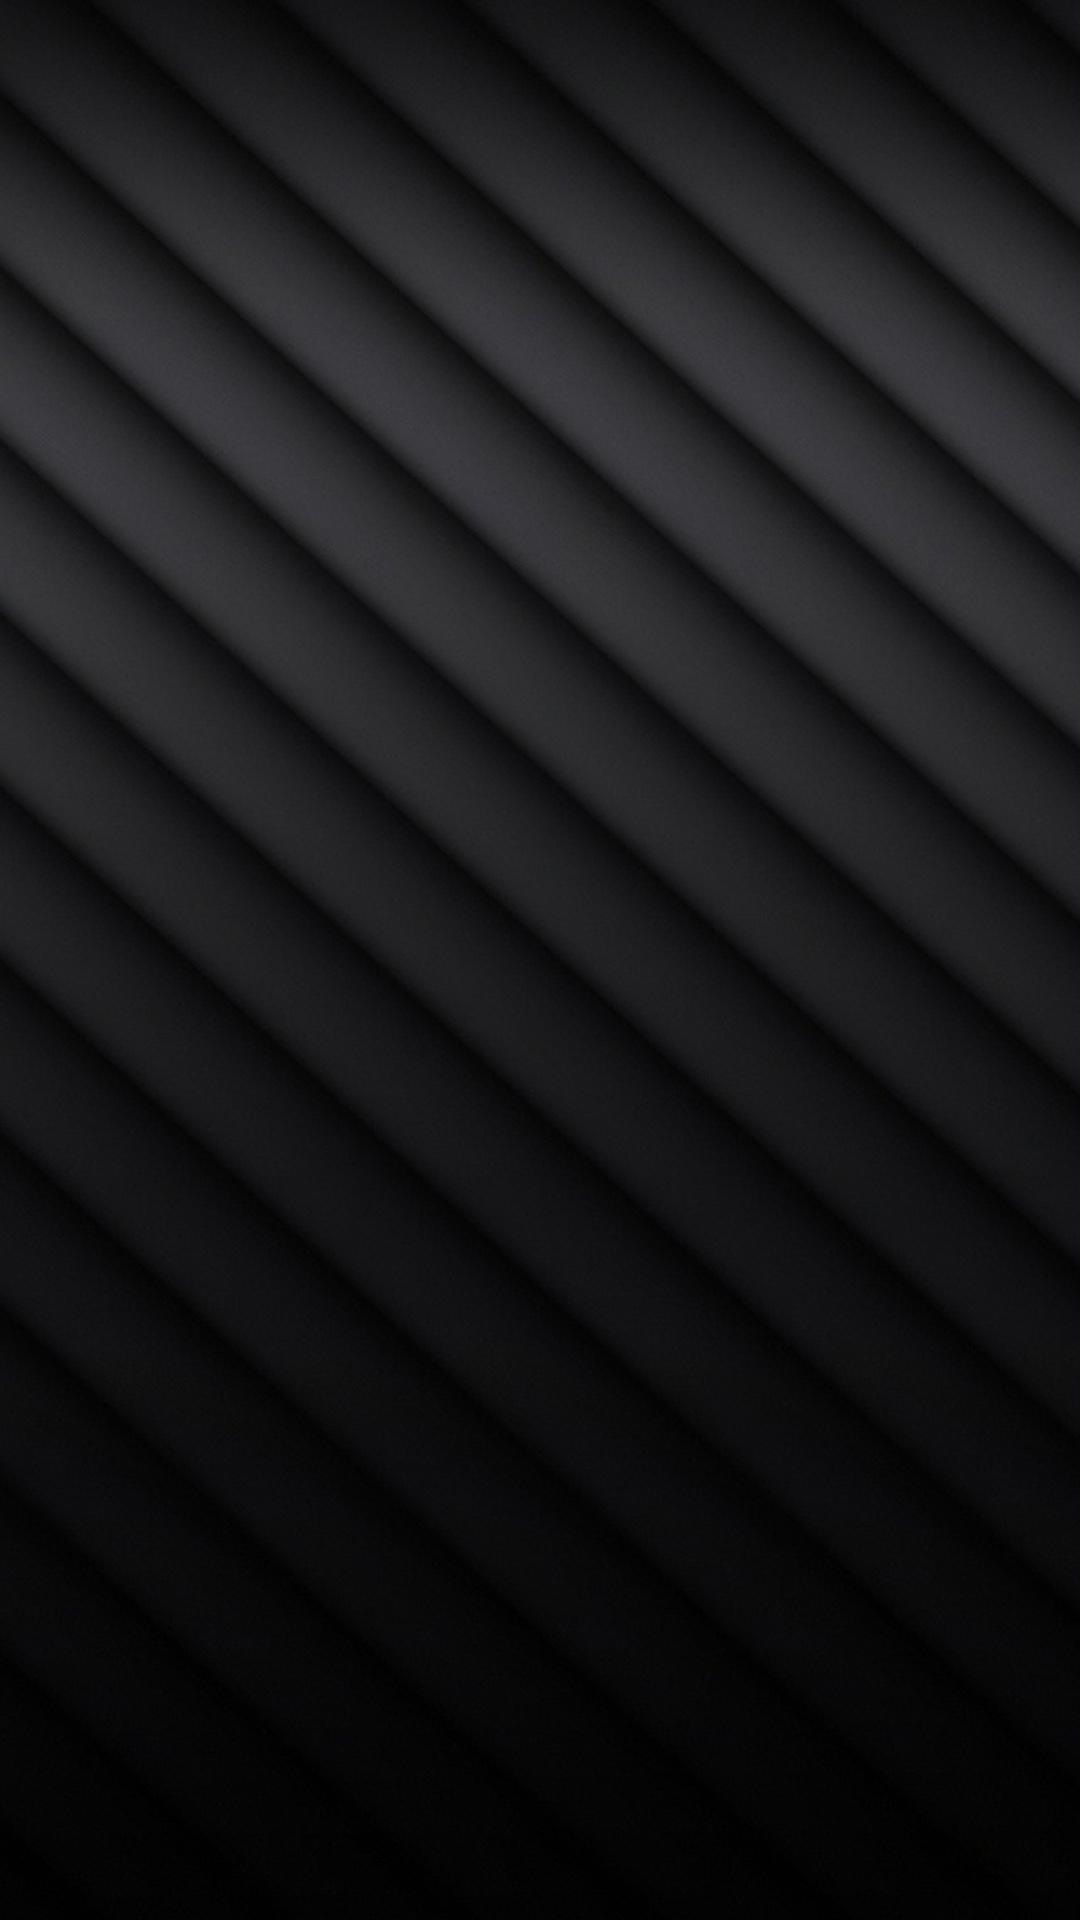 Abstract-Black-Stripes-Note-Samsung-Galaxy-Note-wallpaper-wp5803268-1